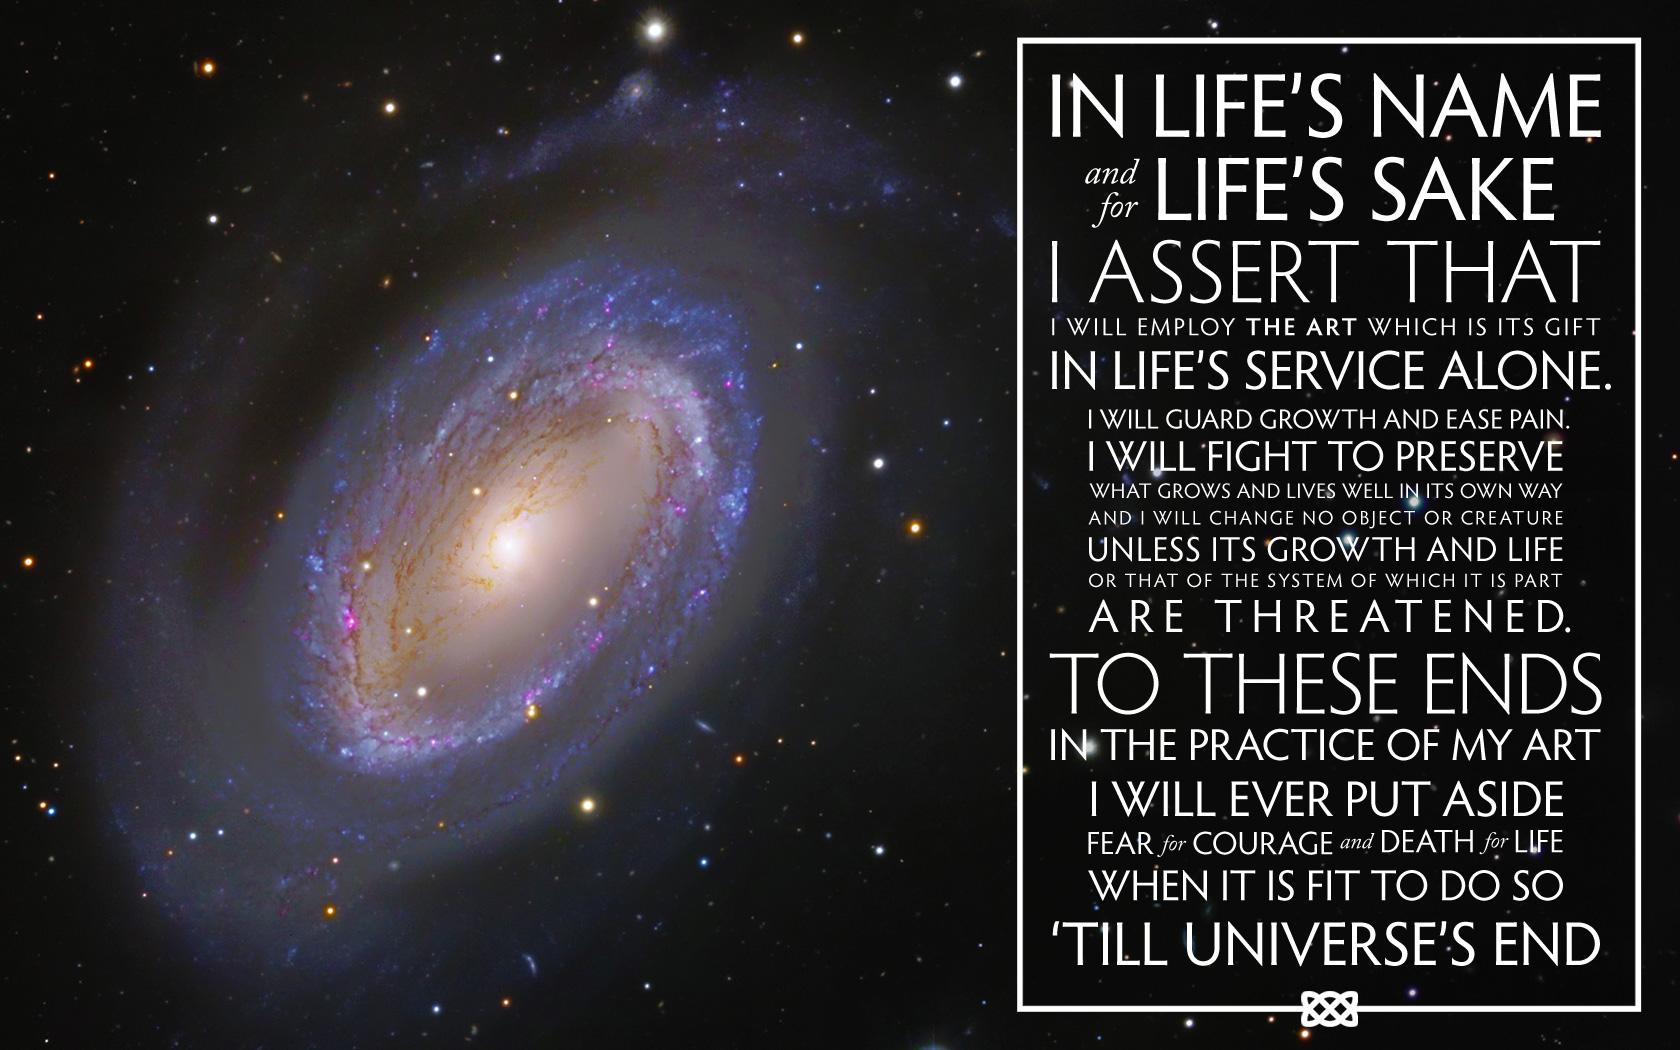 Wizard's Oath: NGC 4725 by DawnPaladin